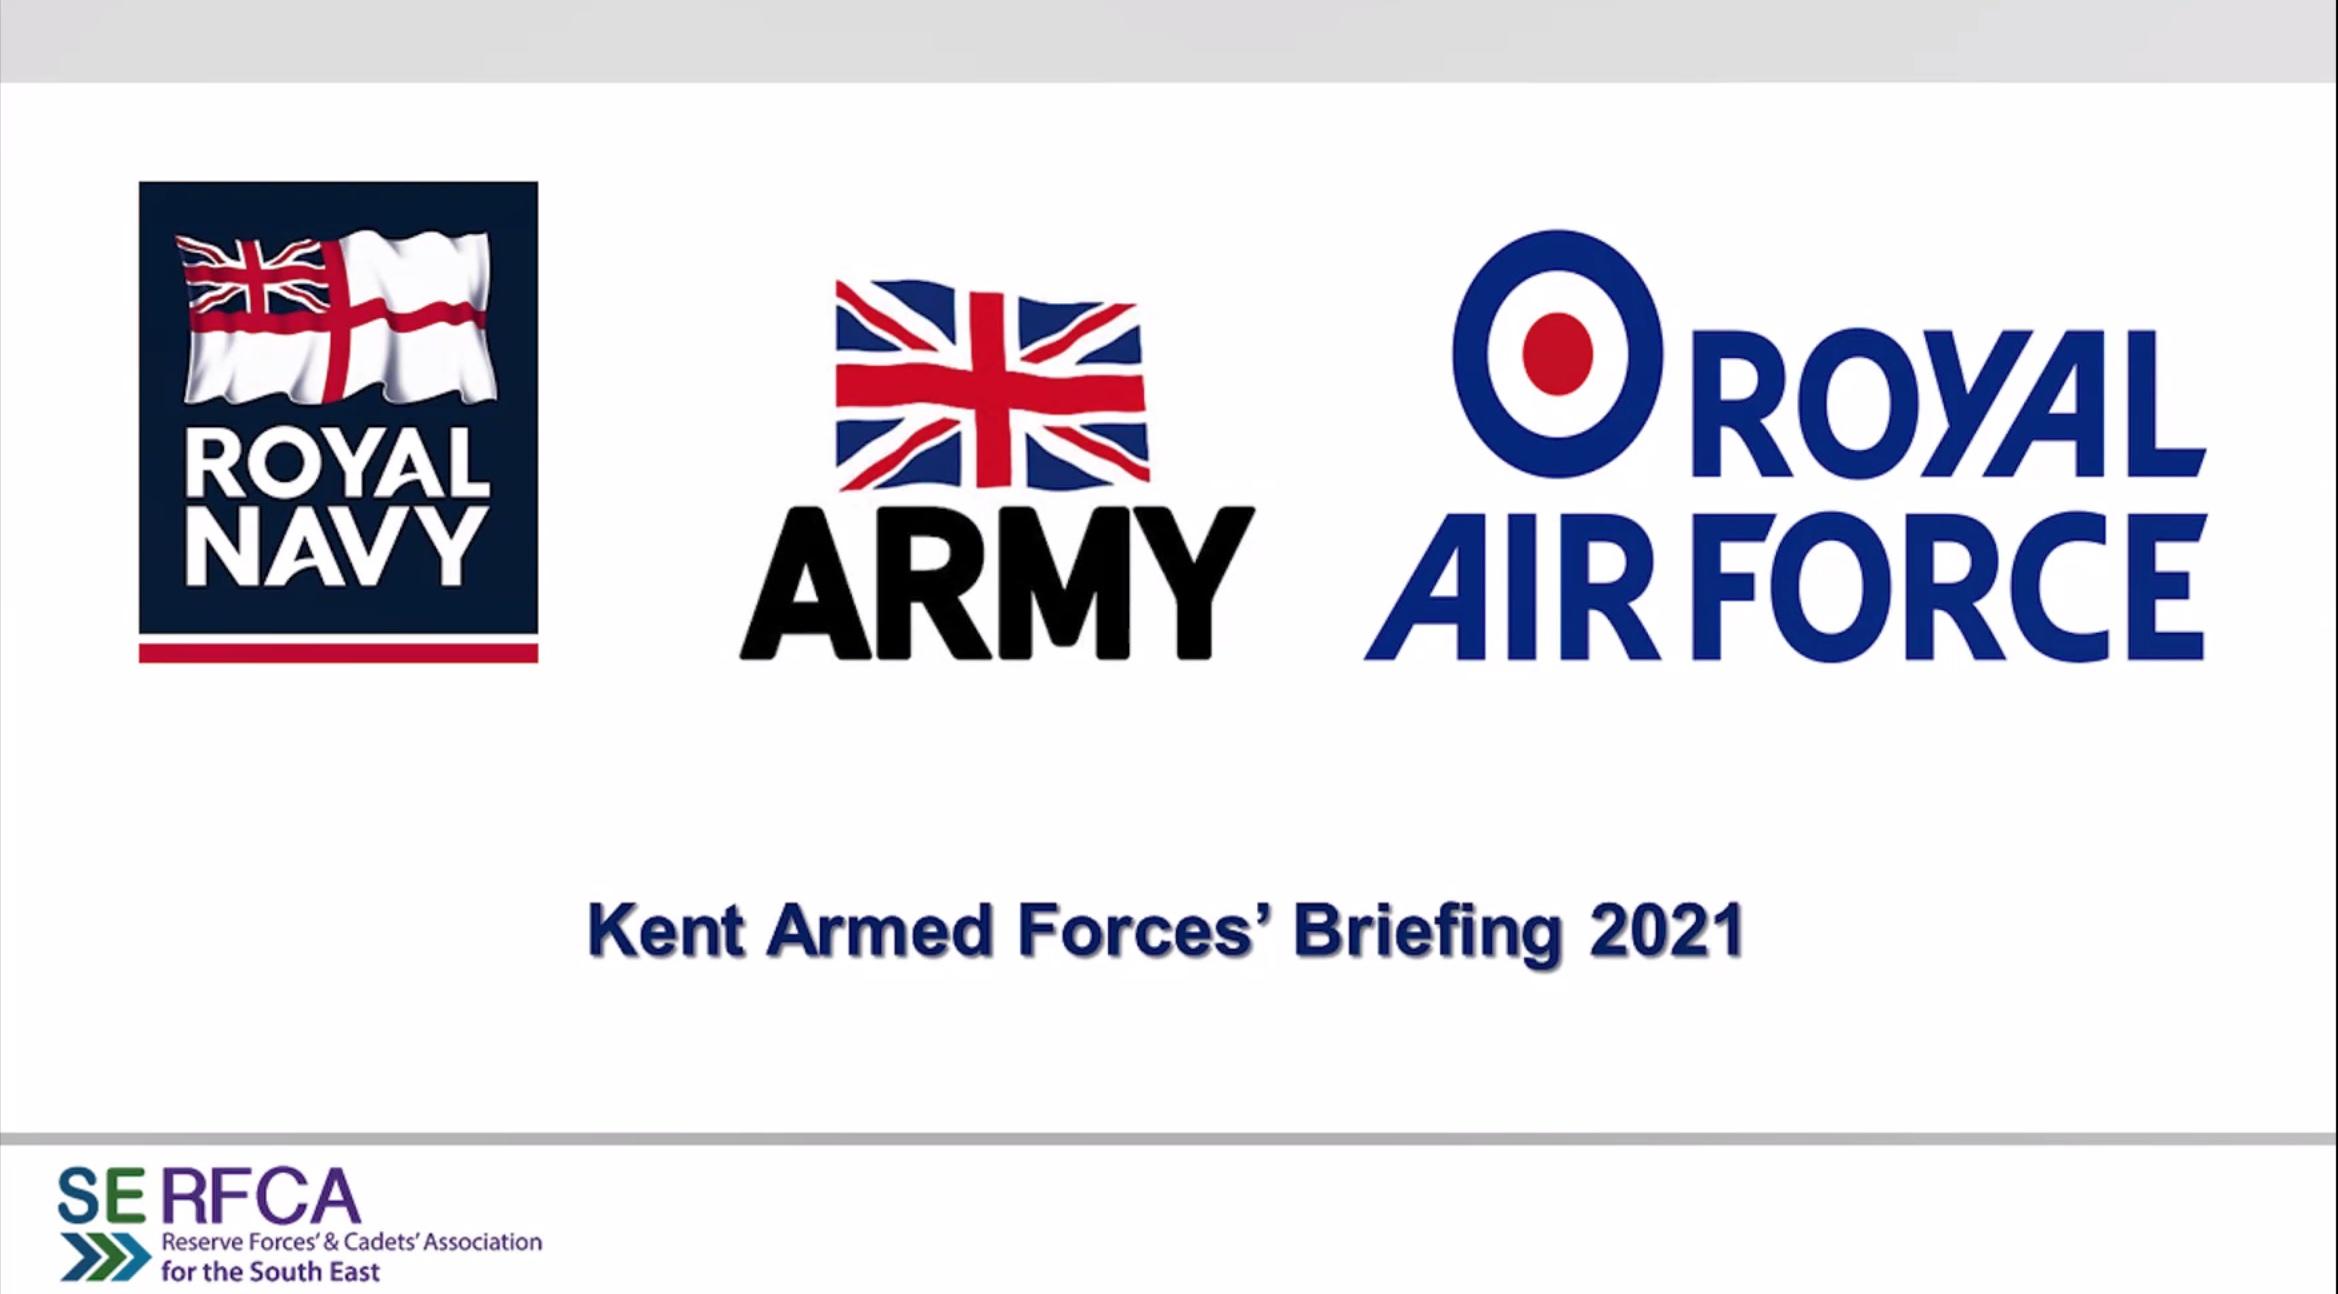 South East Reserve Forces & Cadets Association